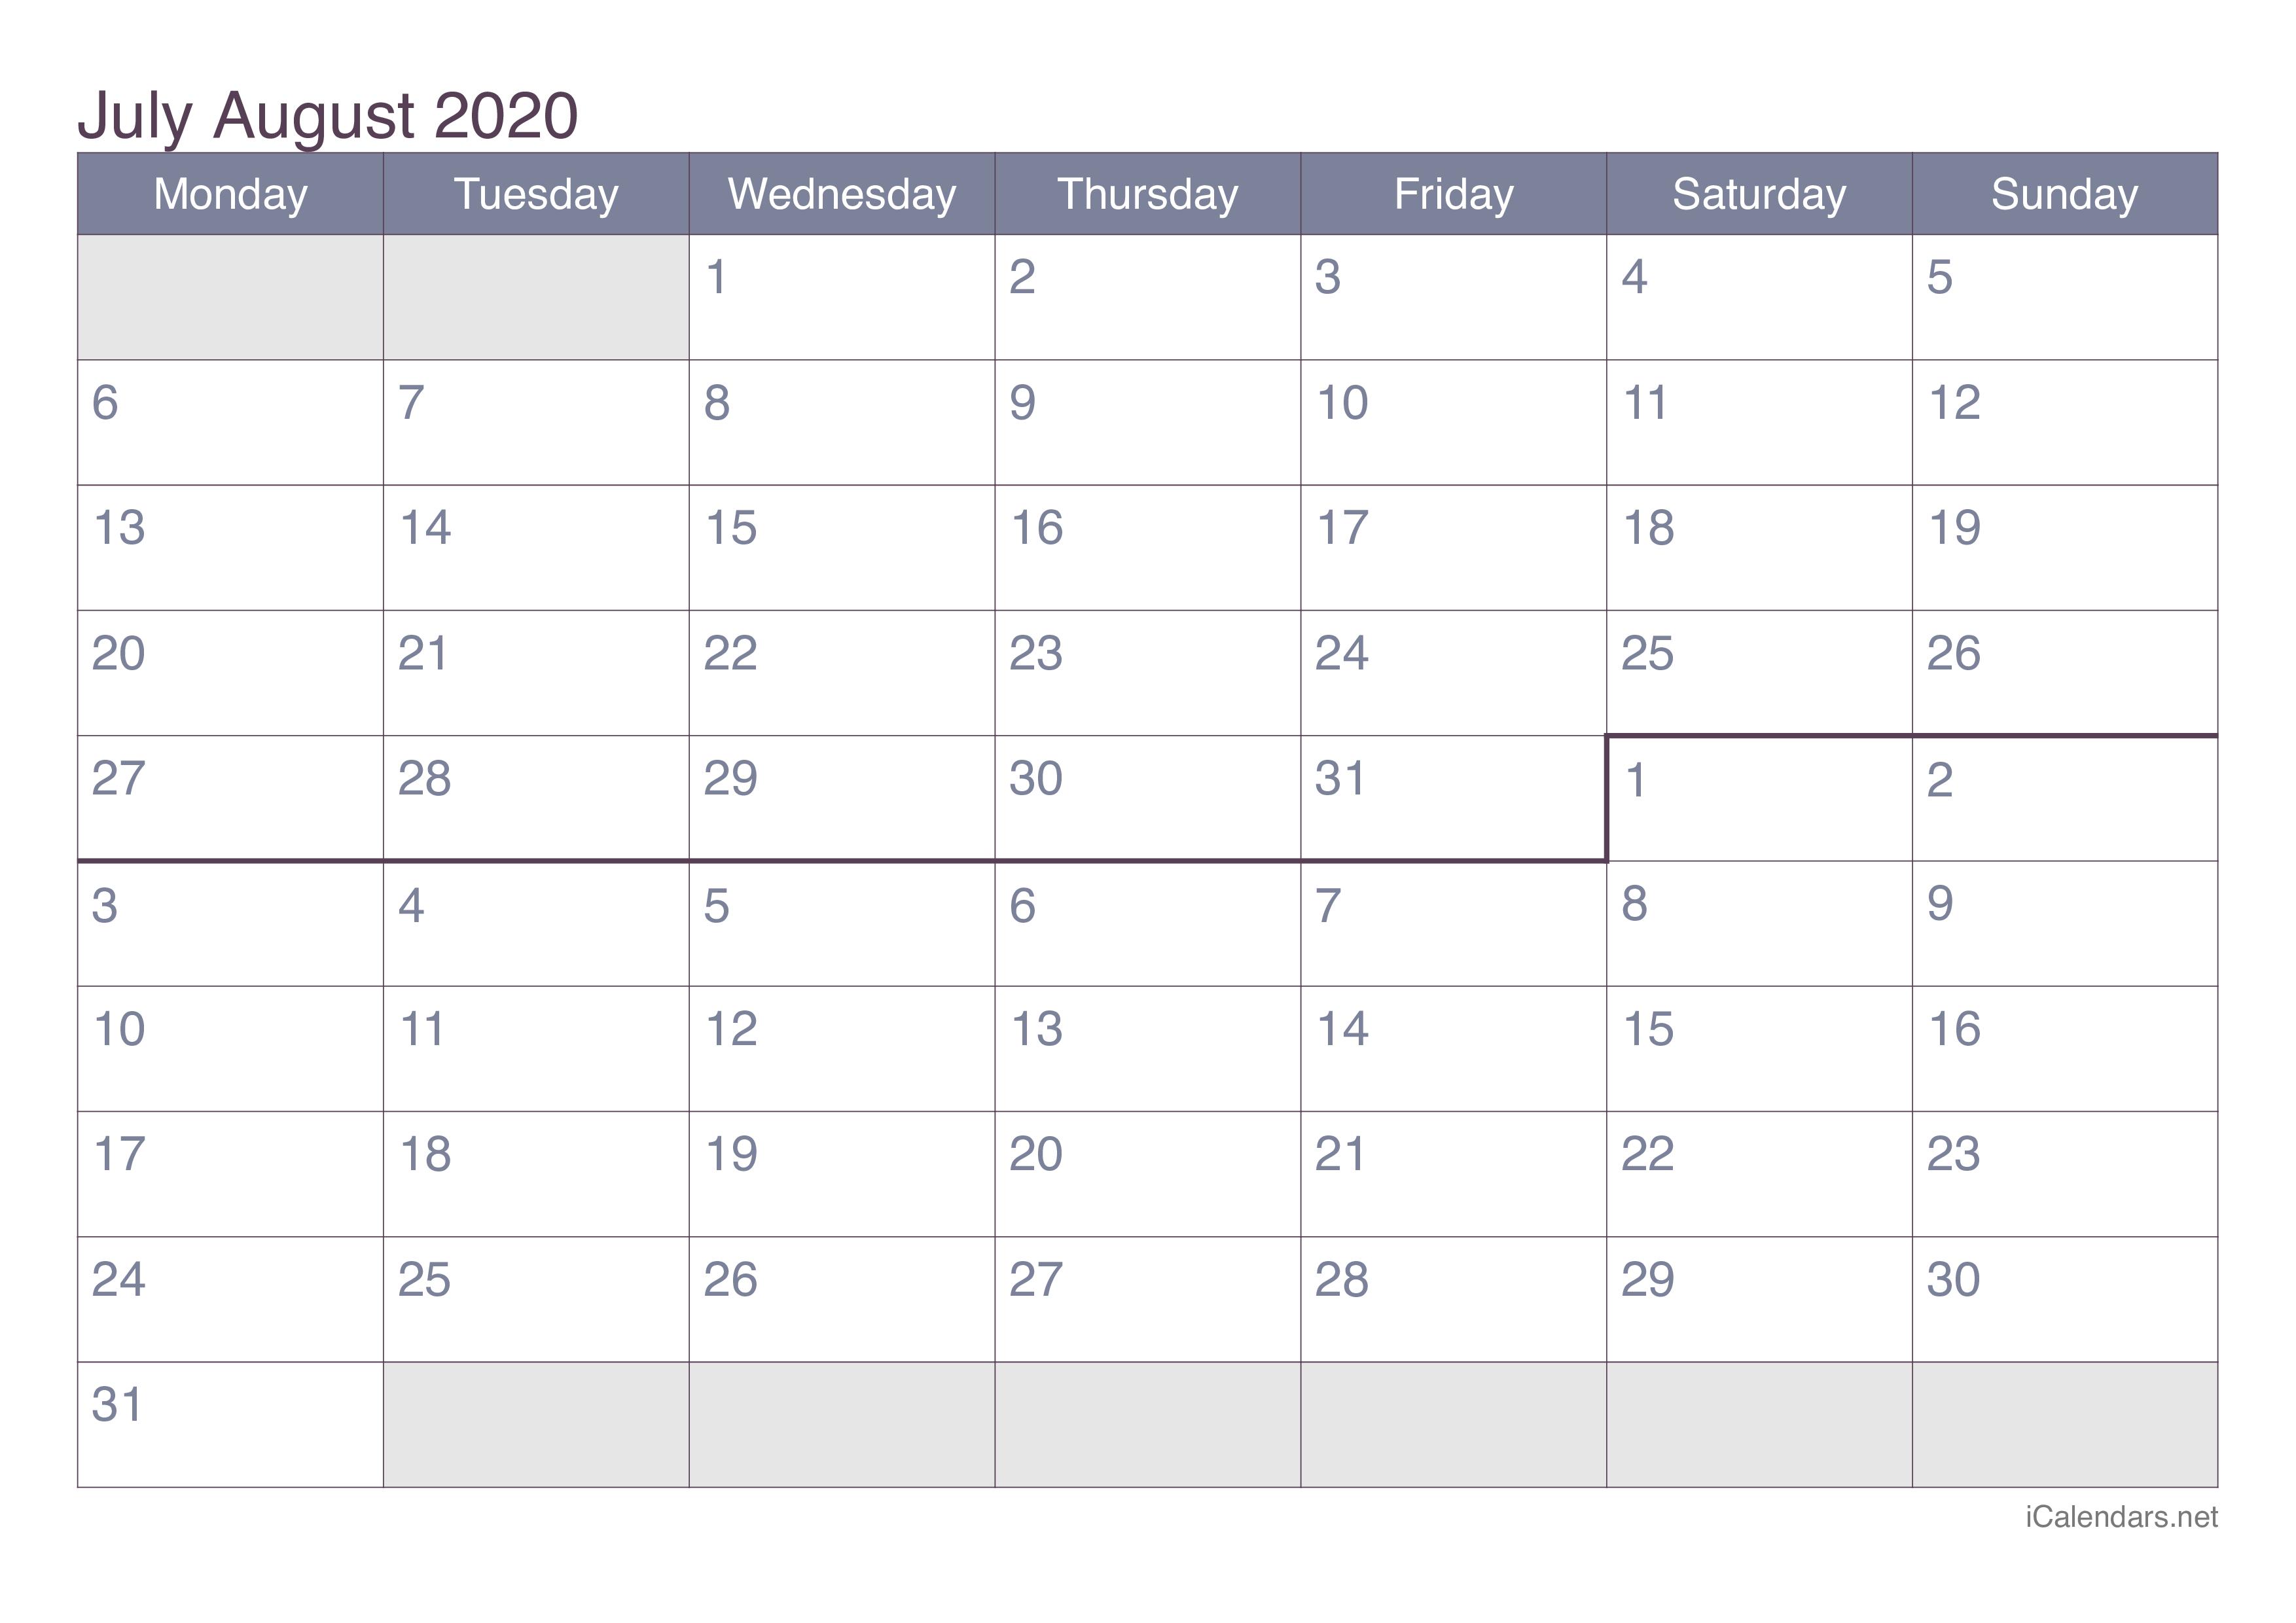 July And August 2020 Printable Calendar - Icalendars in Calendar 2020 Sat Thru Sunday